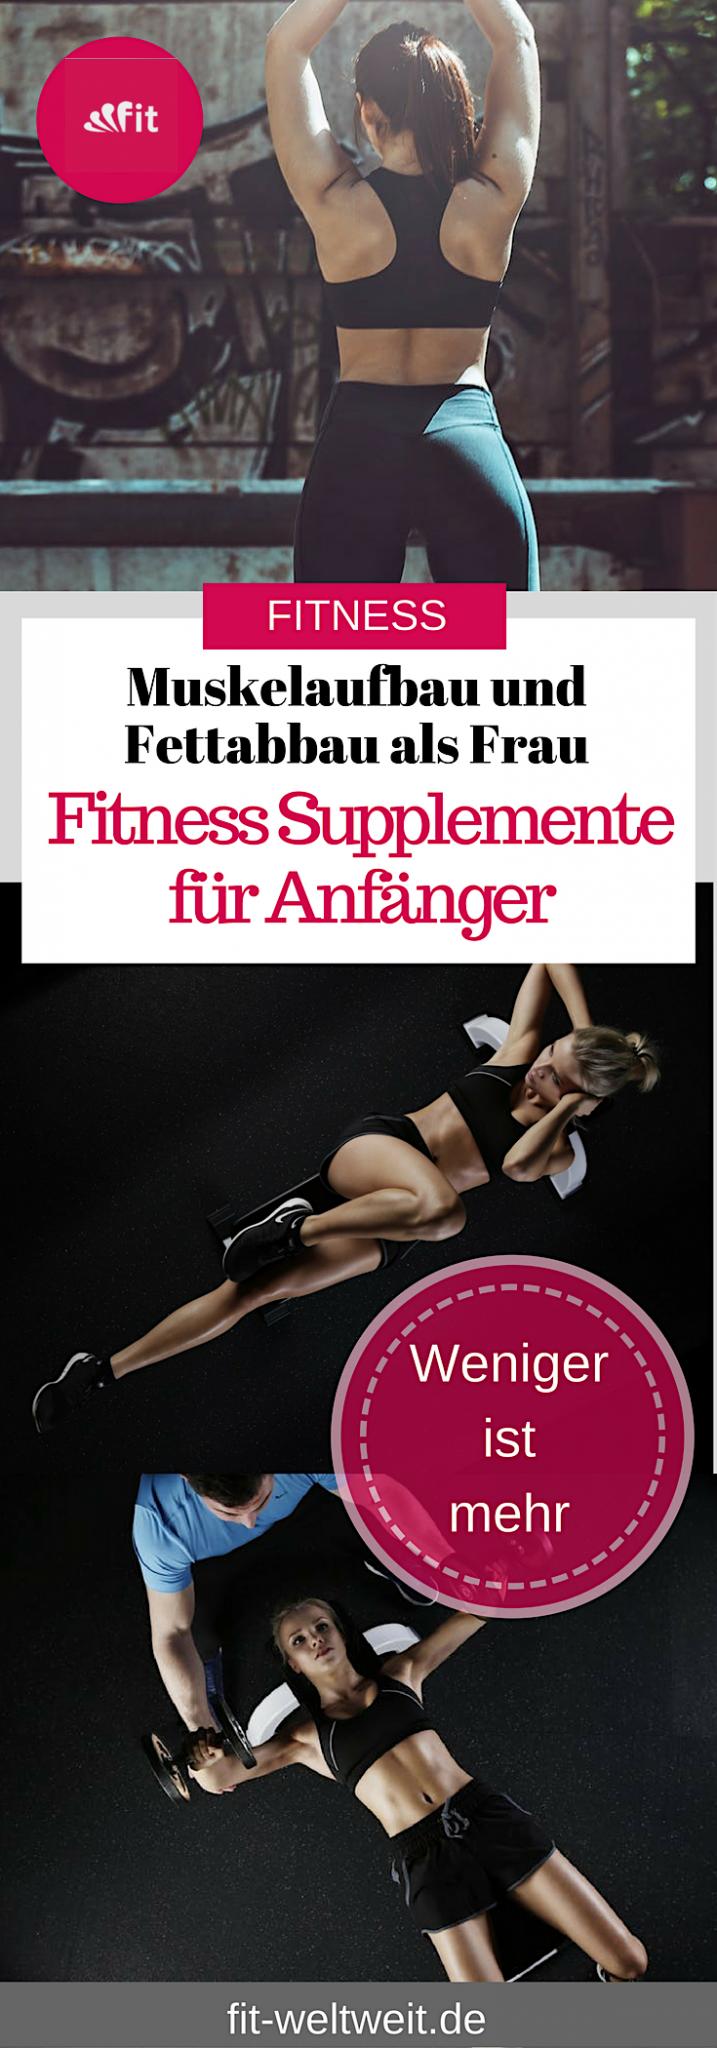 fitness supplemente f r anf nger muskelaufbau und. Black Bedroom Furniture Sets. Home Design Ideas